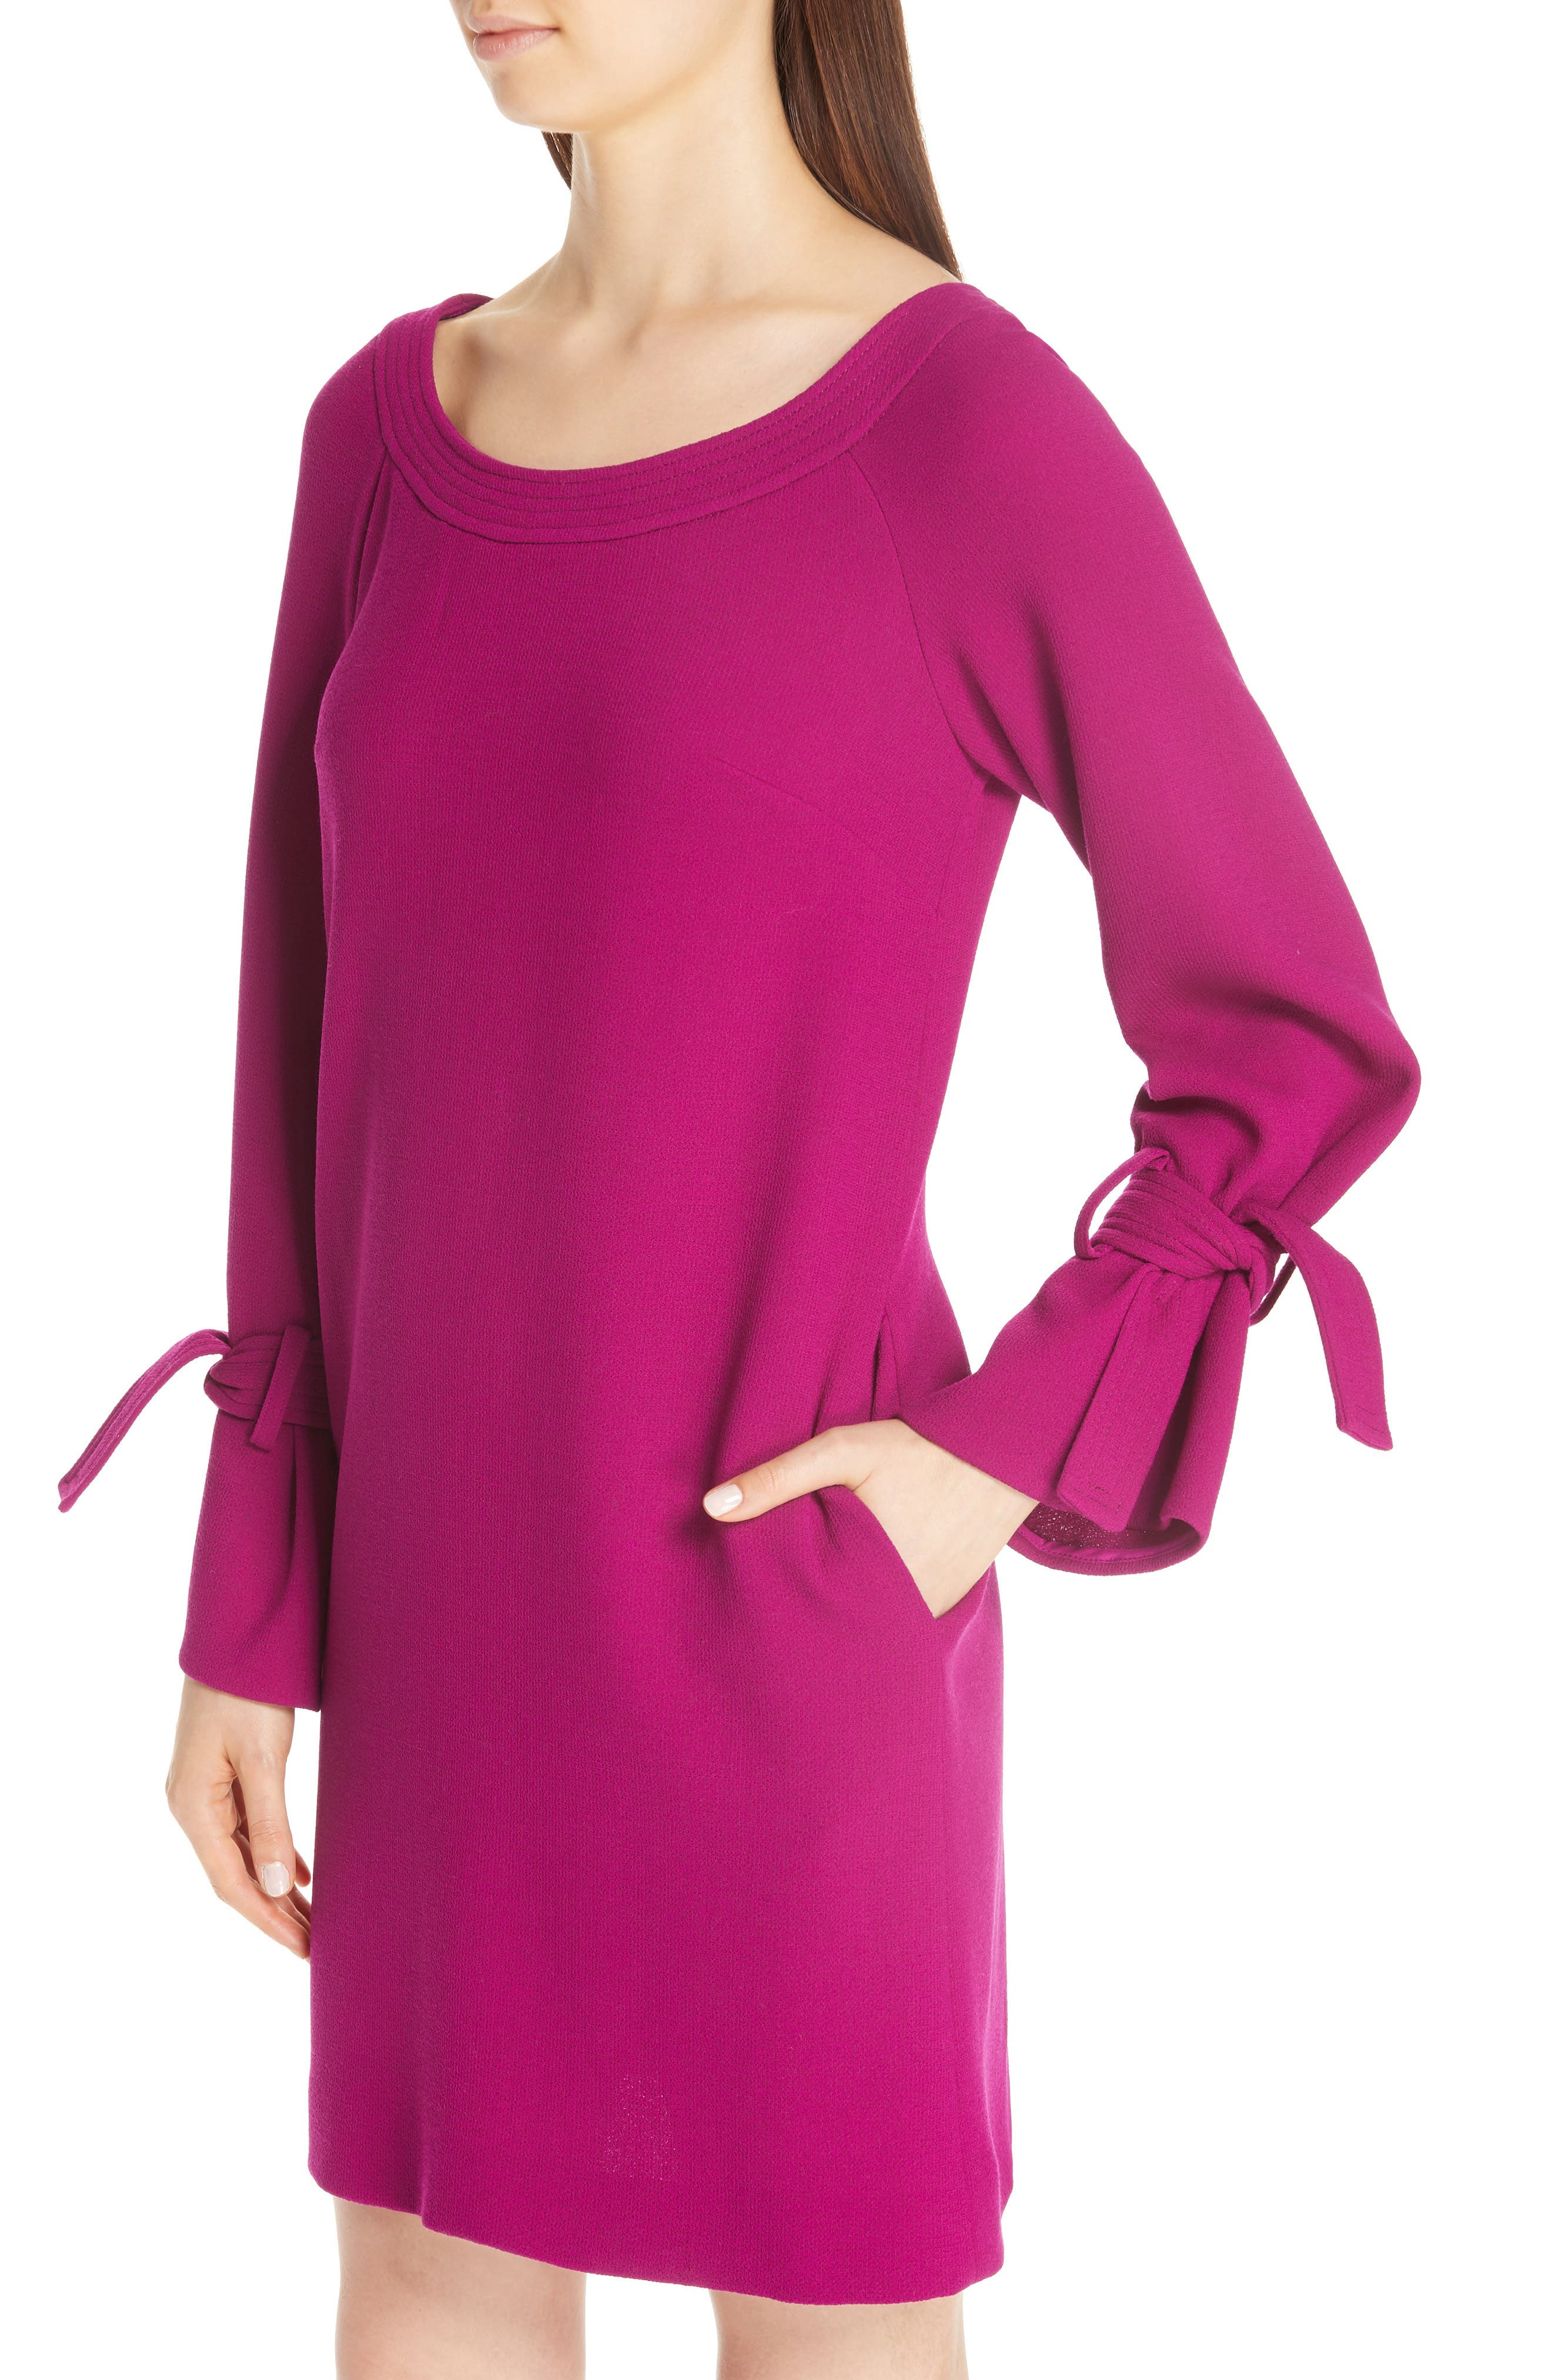 LELA ROSE, Tie Cuff Wool Blend Crepe Shift Dress, Alternate thumbnail 4, color, MAGENTA